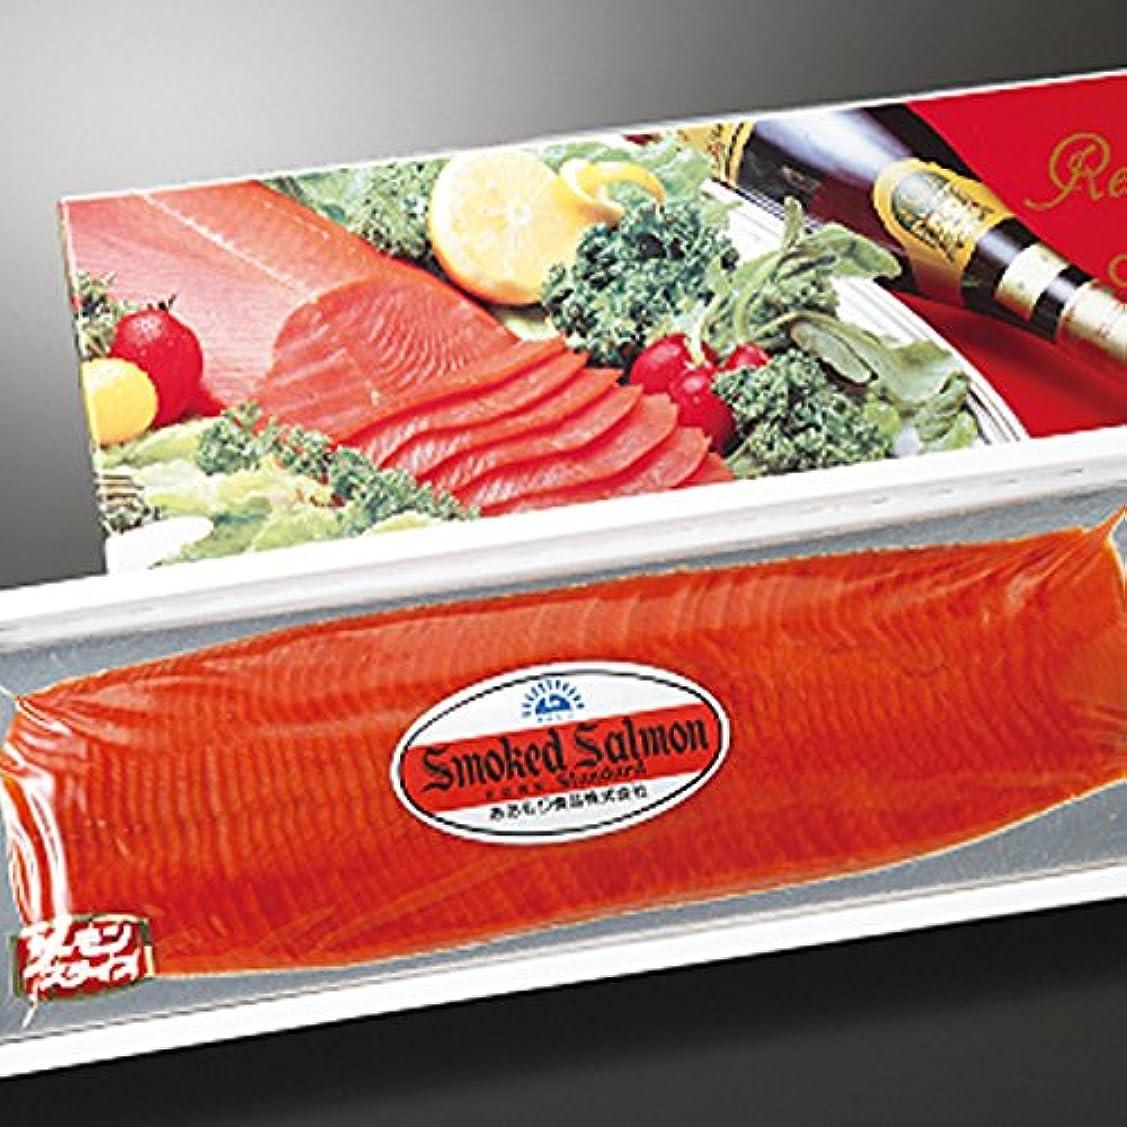 放棄義務的天窓紅鮭燻製スライス A300【送料込】 青森